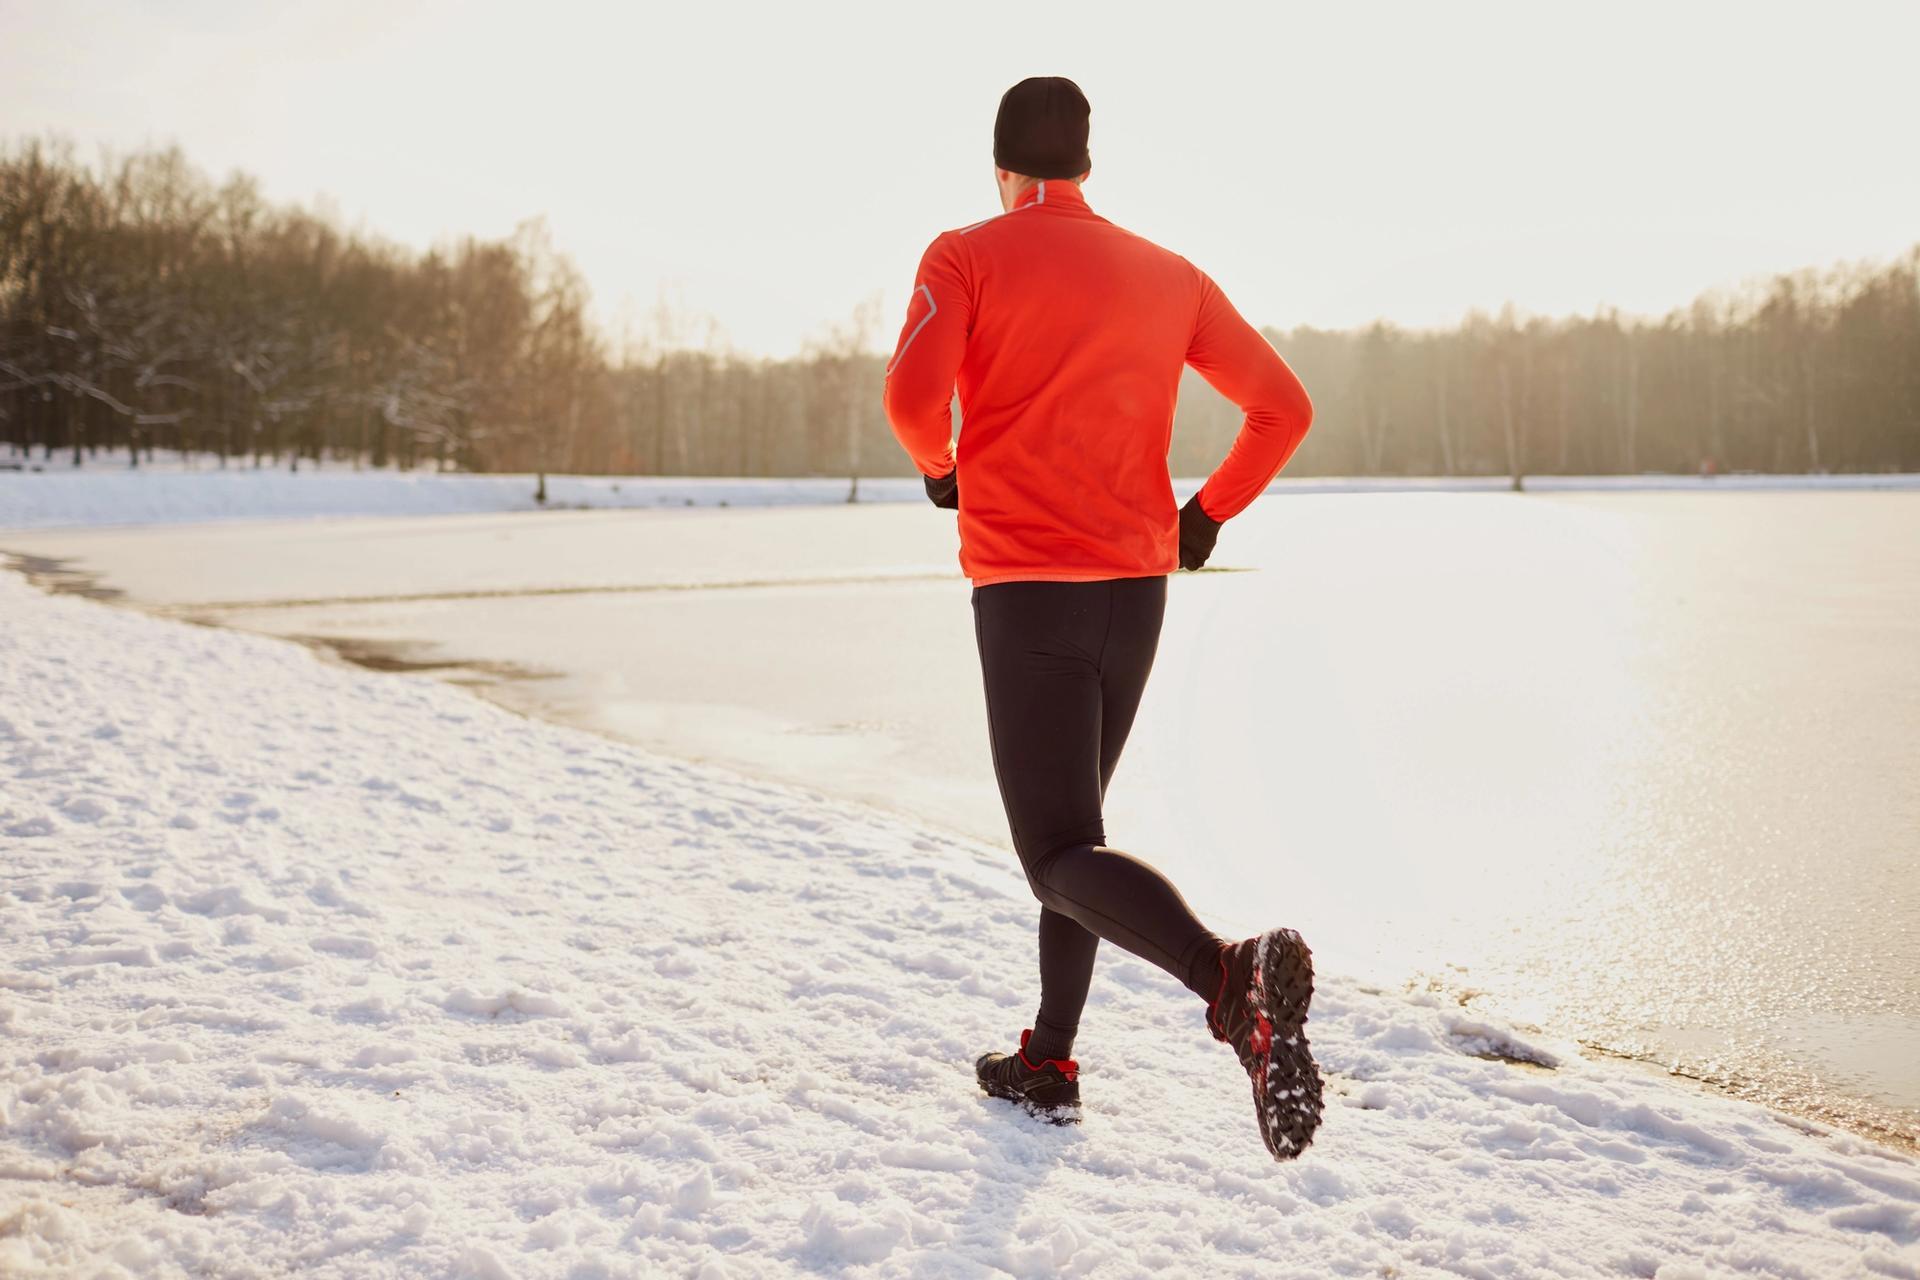 Mann løper på snø